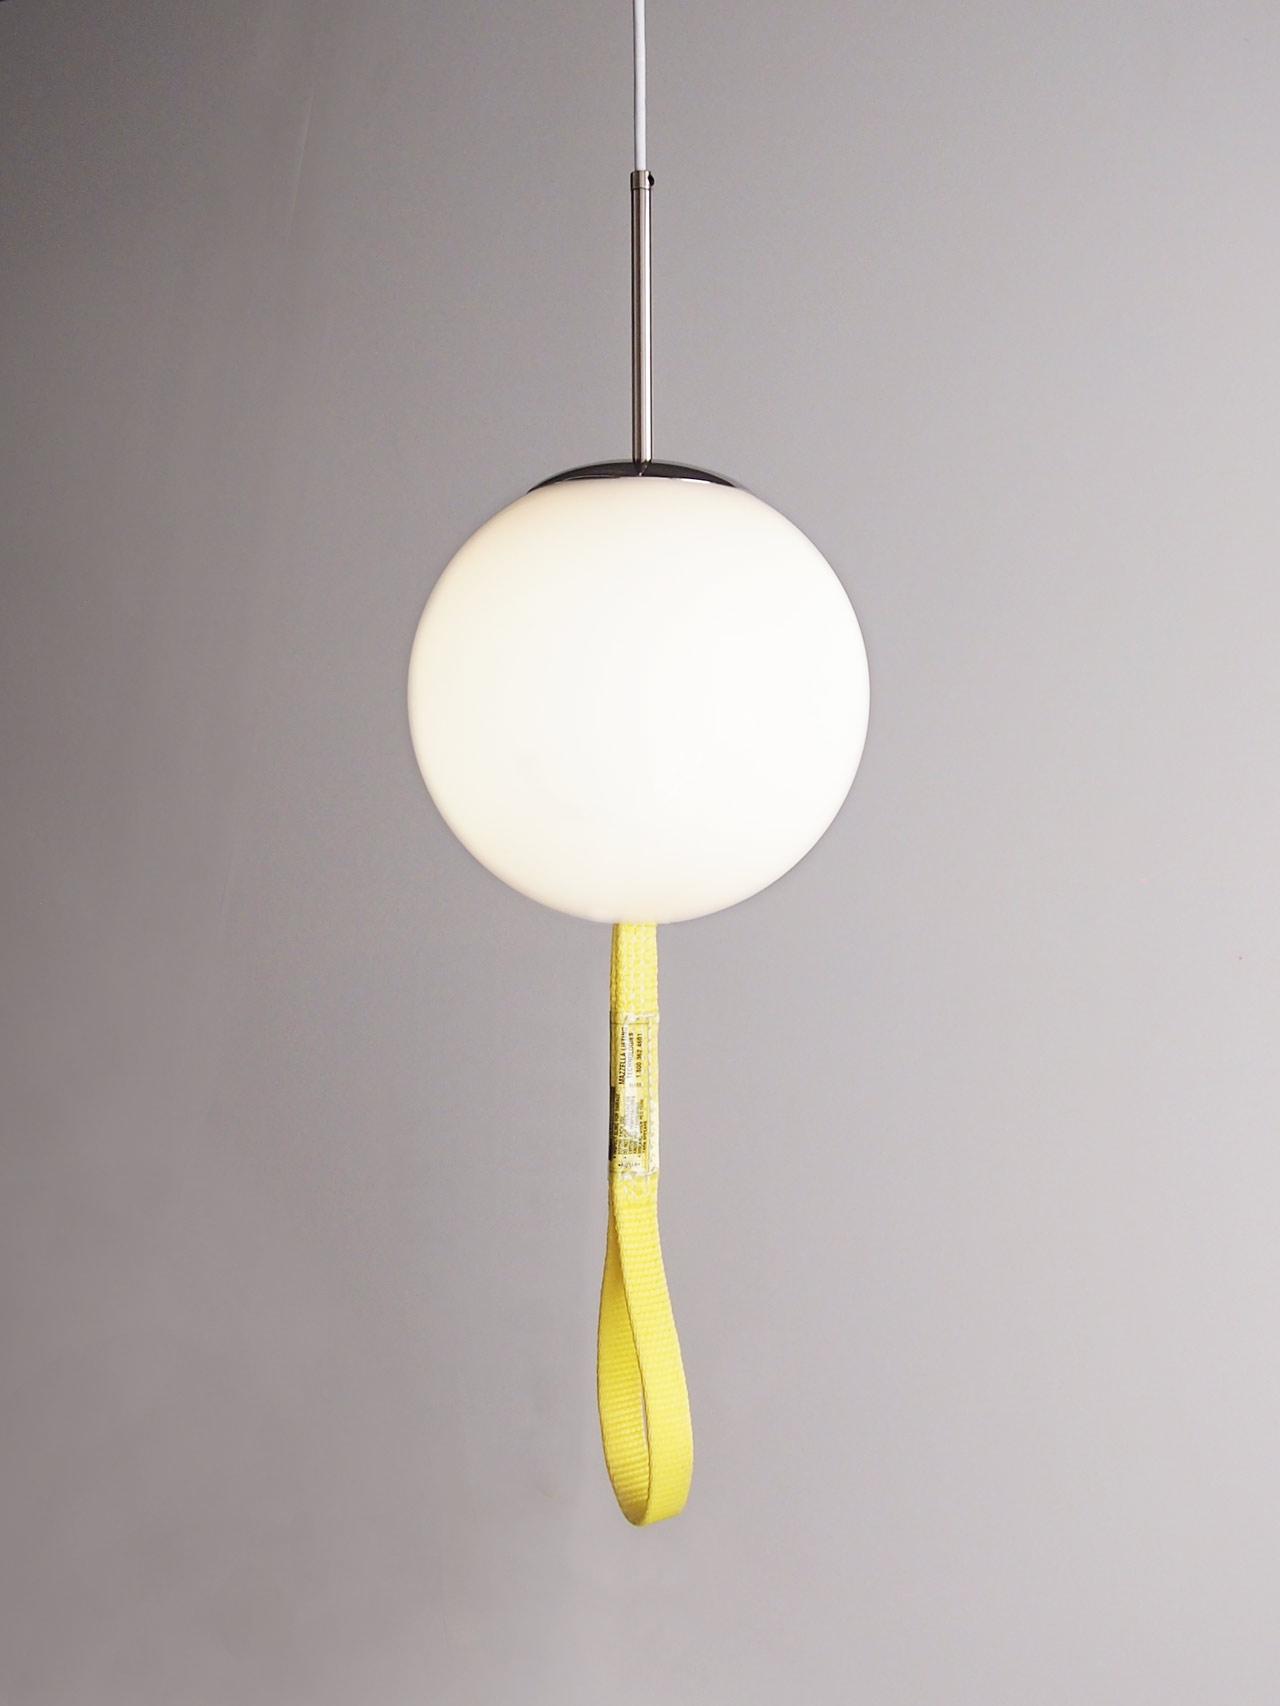 DIY globe pendant light designed by Aandersson